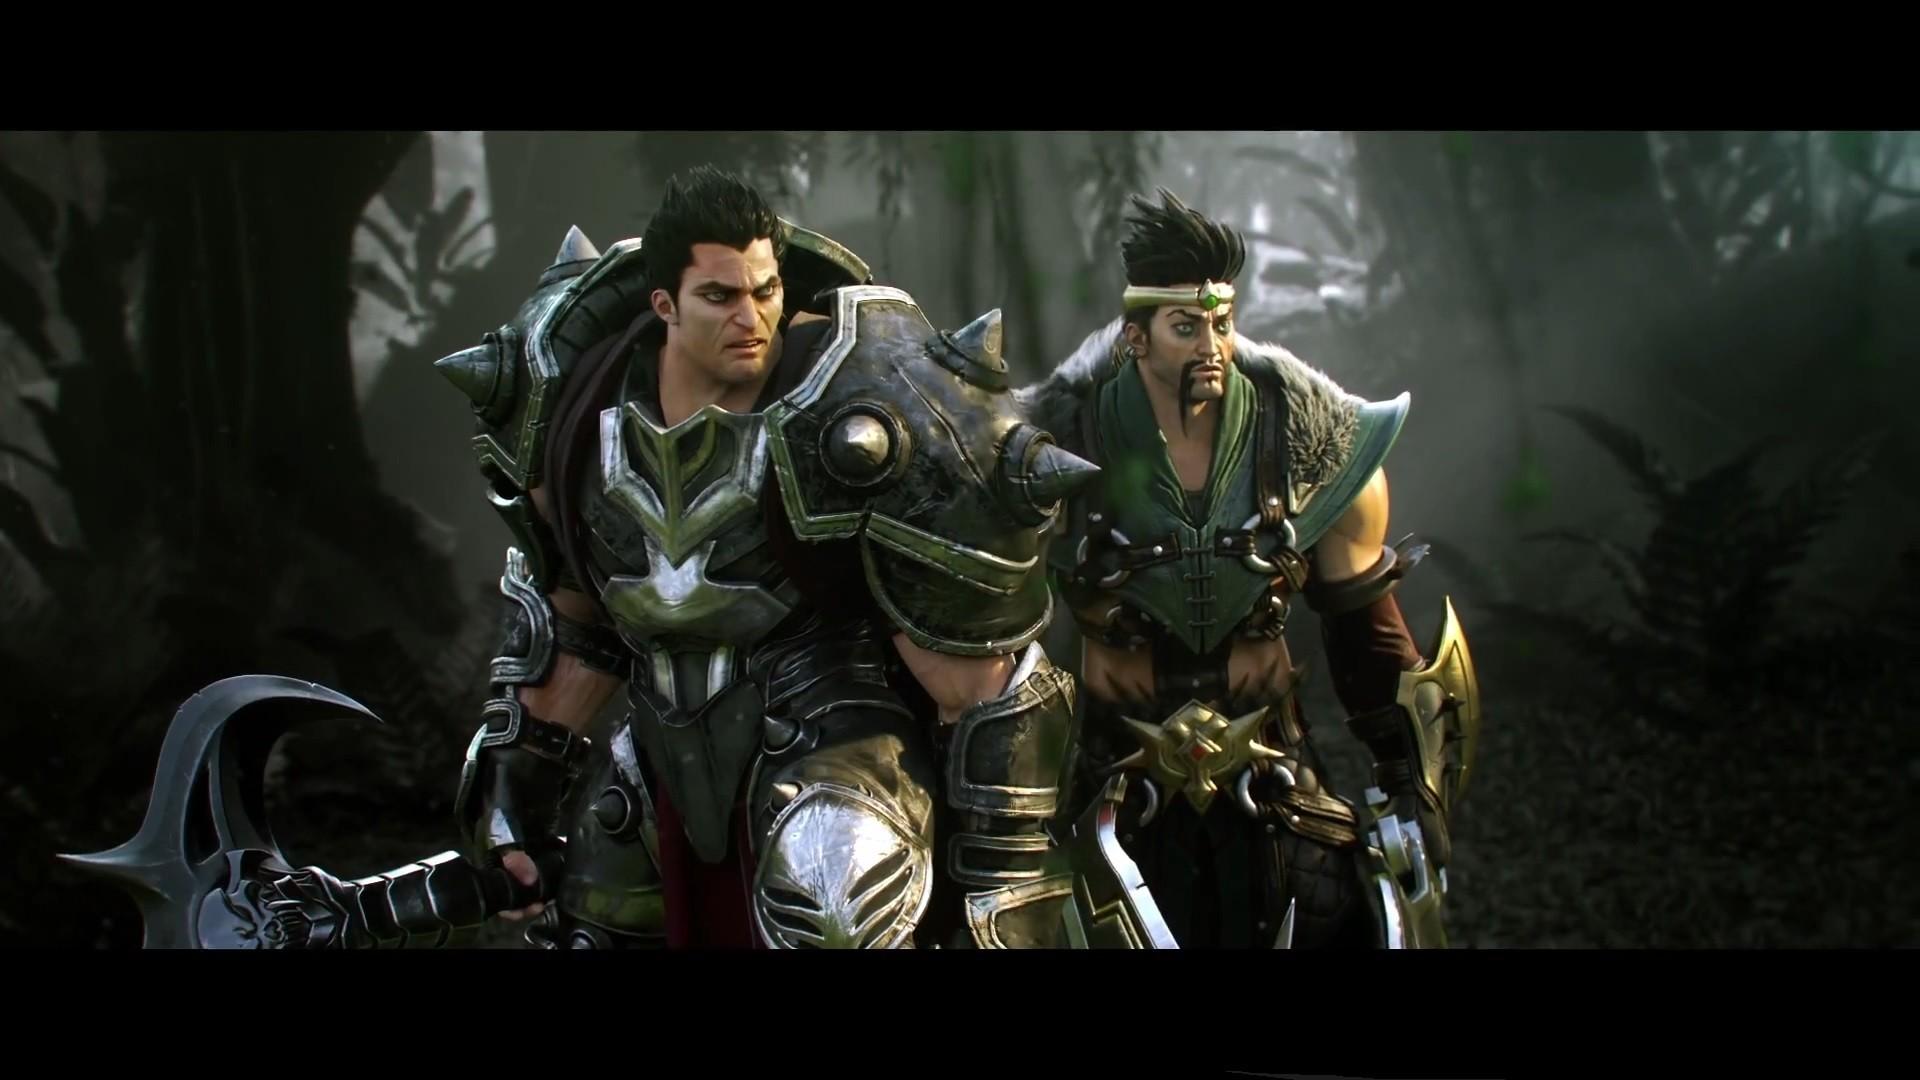 General 1920x1080 Darius Draven League of Legends Dark Brotherhood